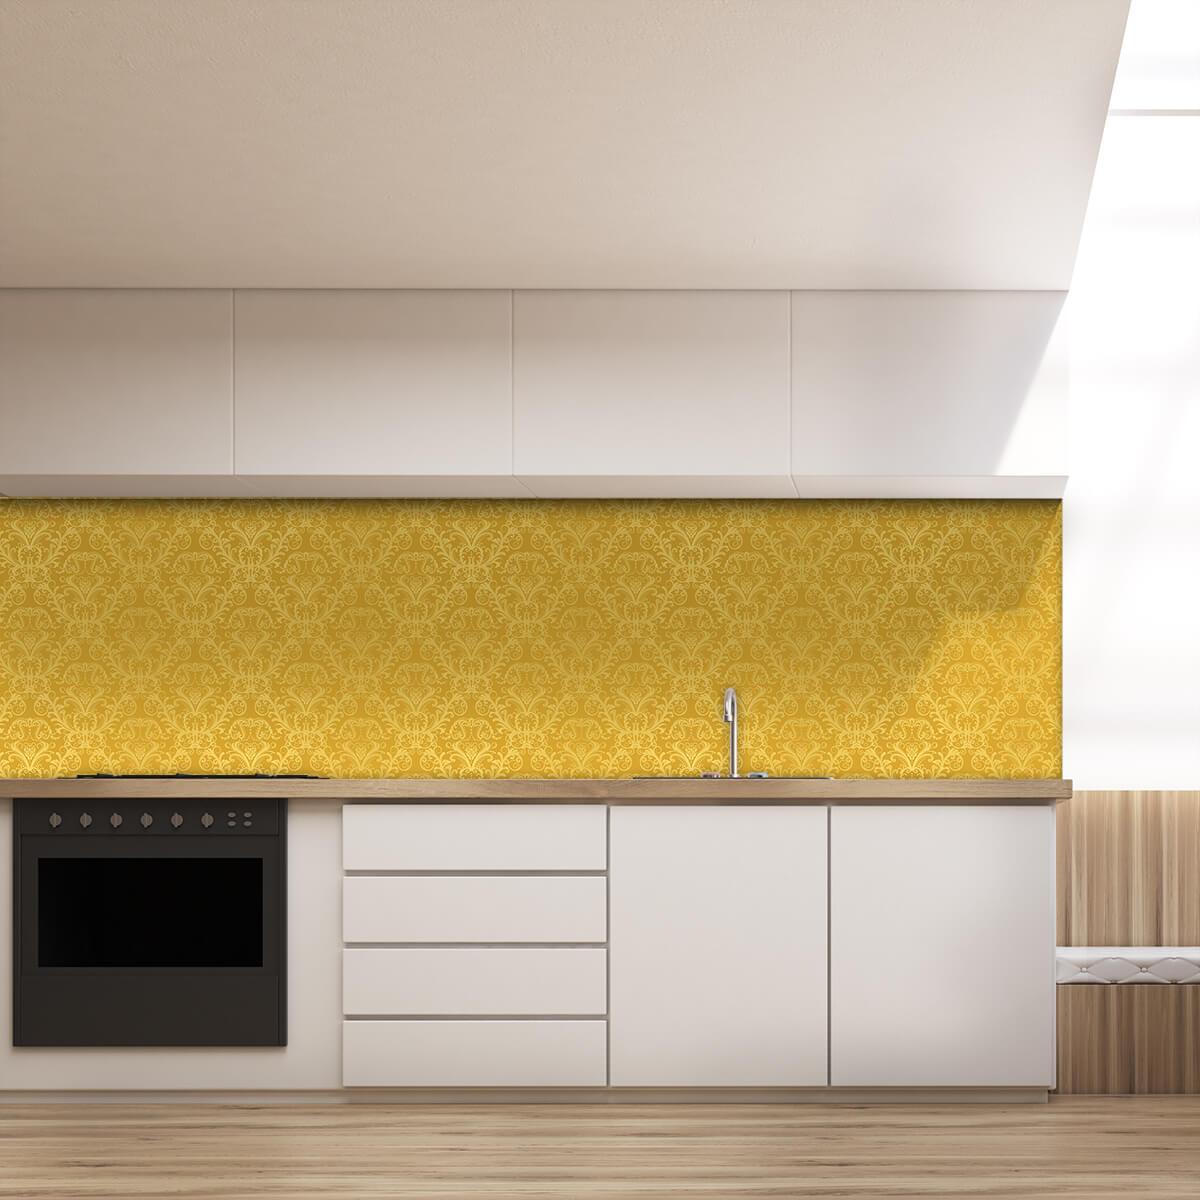 Kuchenruckwand Aus Glas Golden Ornaments 989704901